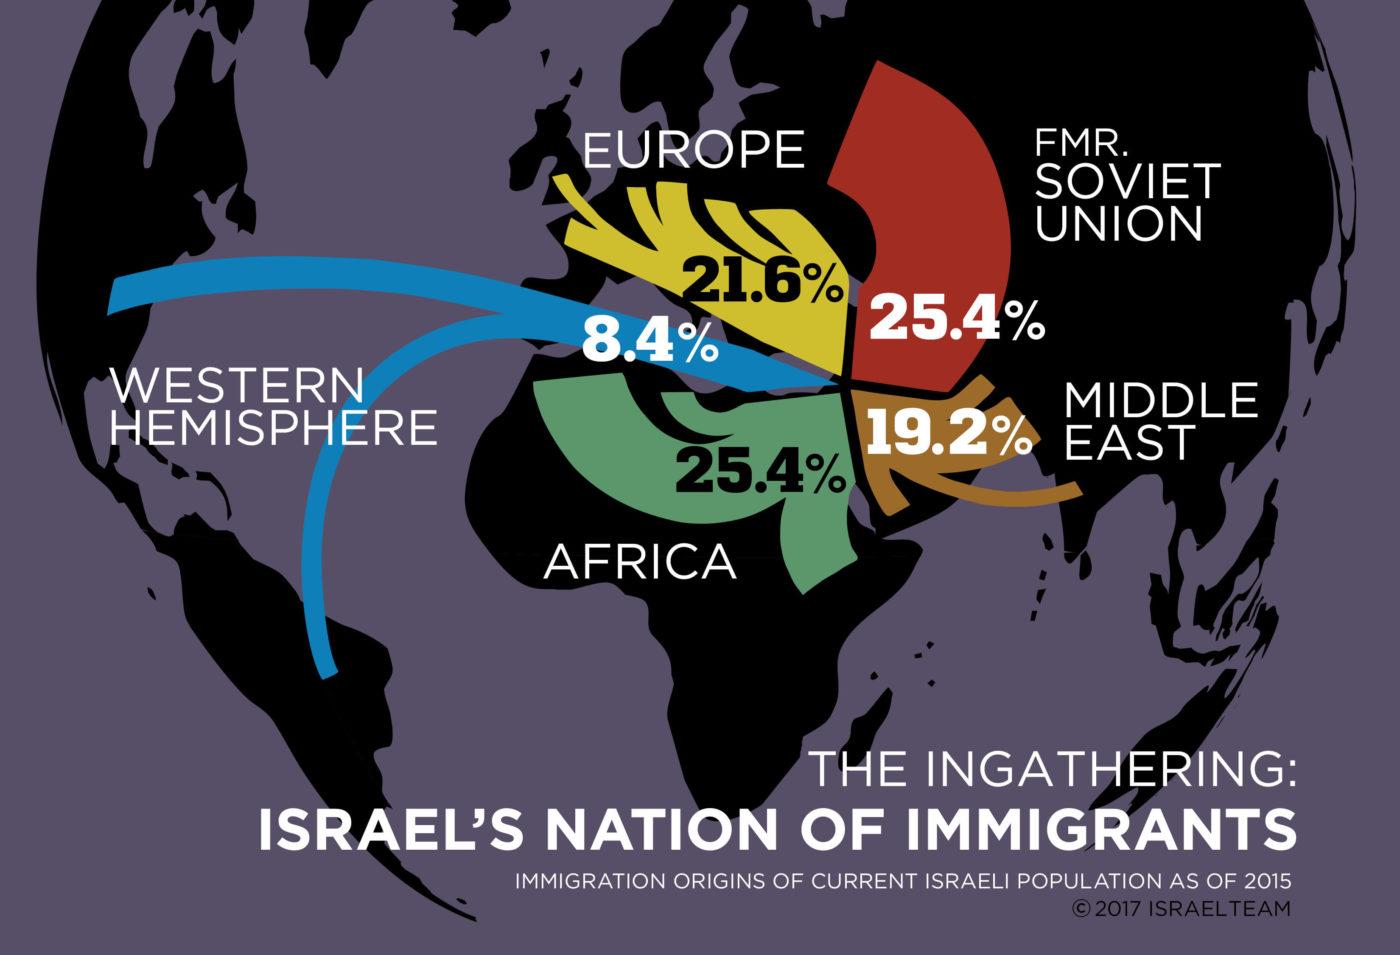 IsraelImmigration-1400x955